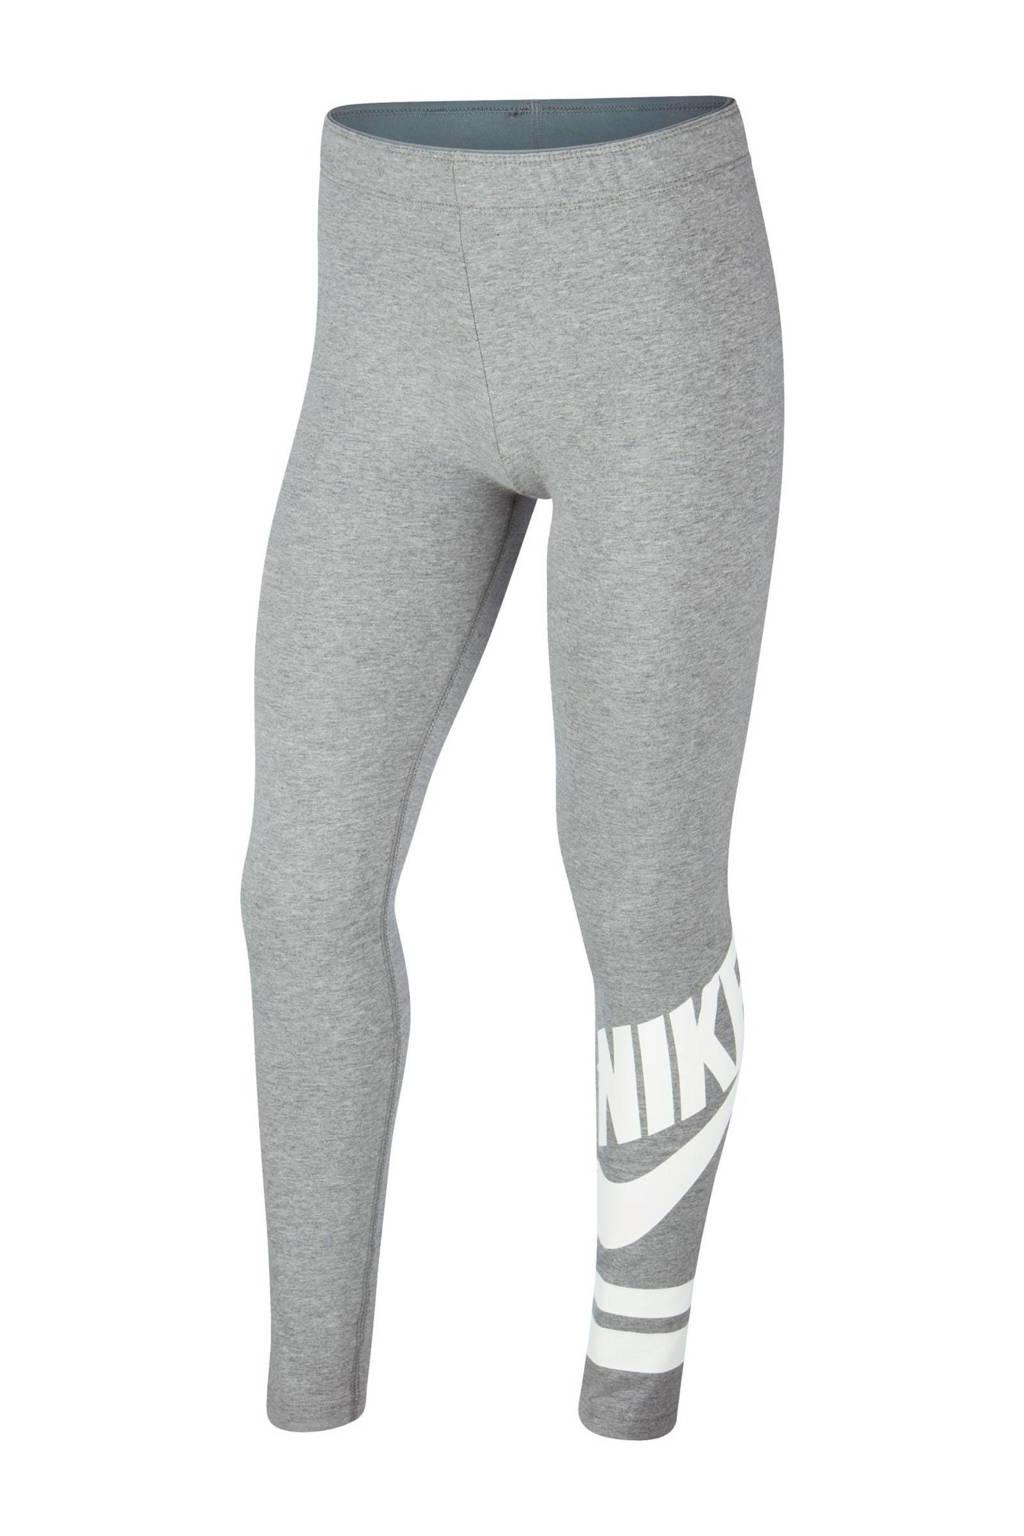 Nike legging grijs, Grijs